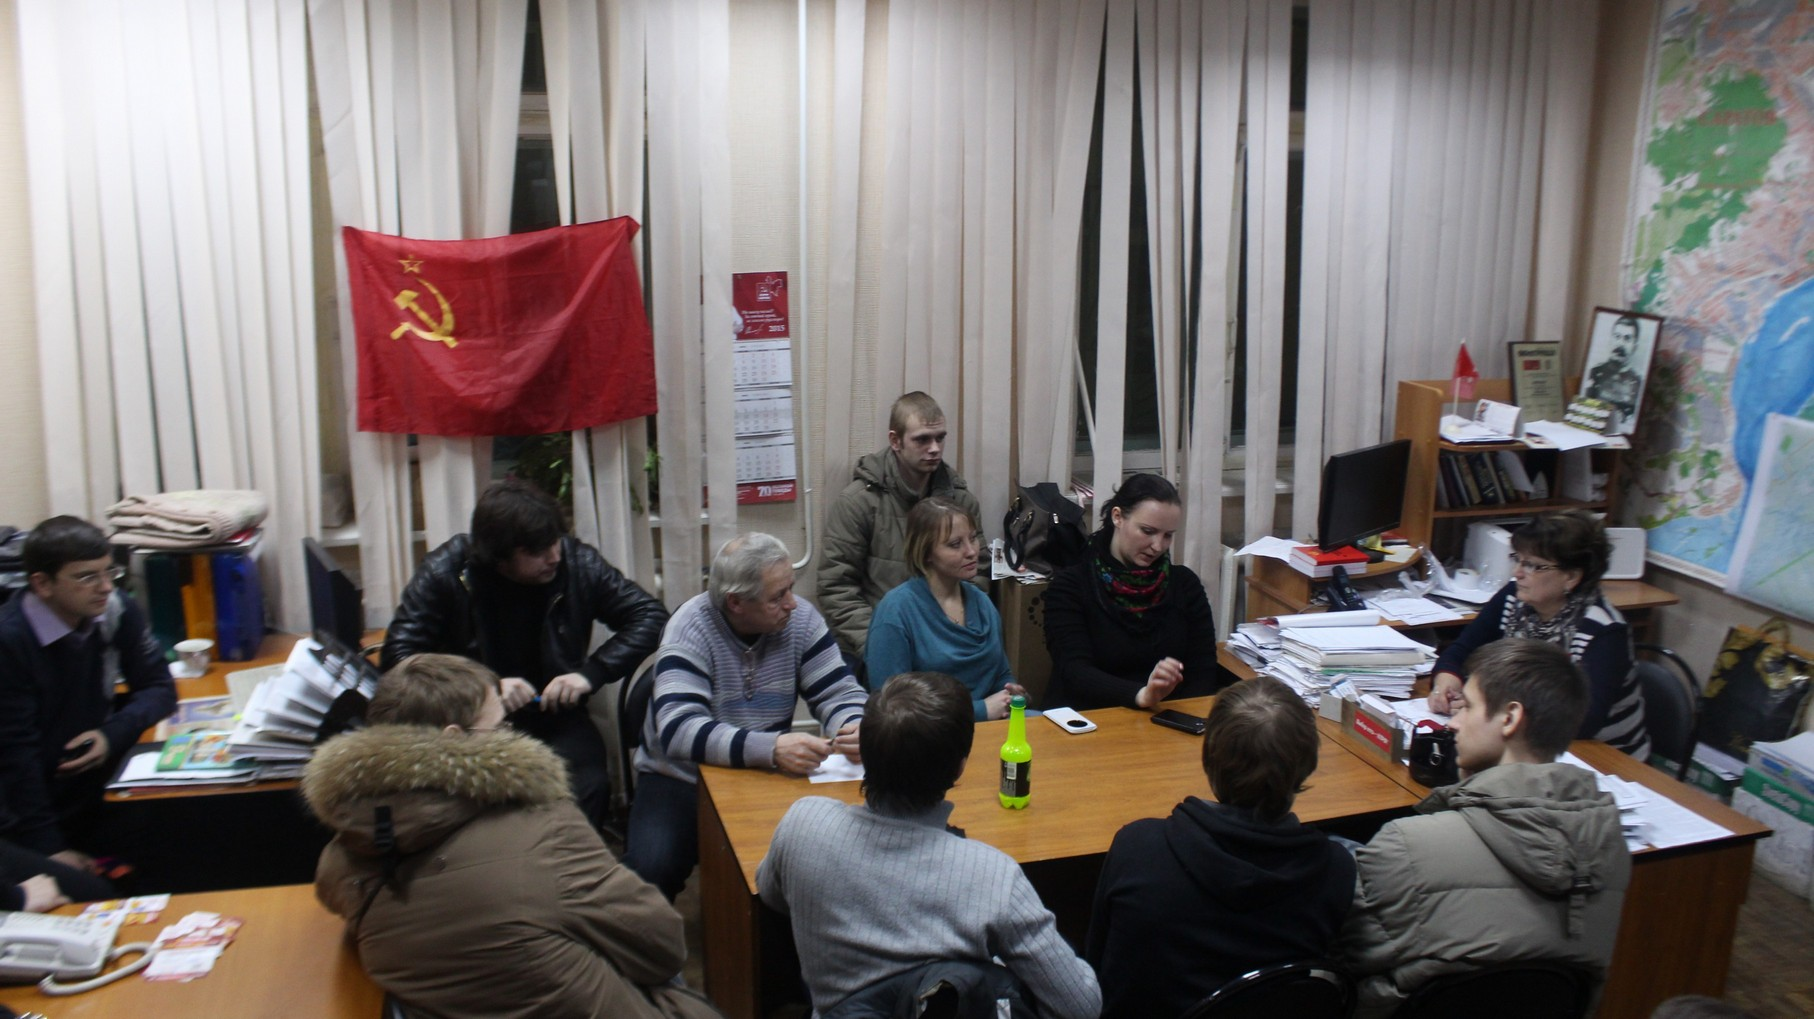 Ольга Алимова: У нас замечательная молодежь!